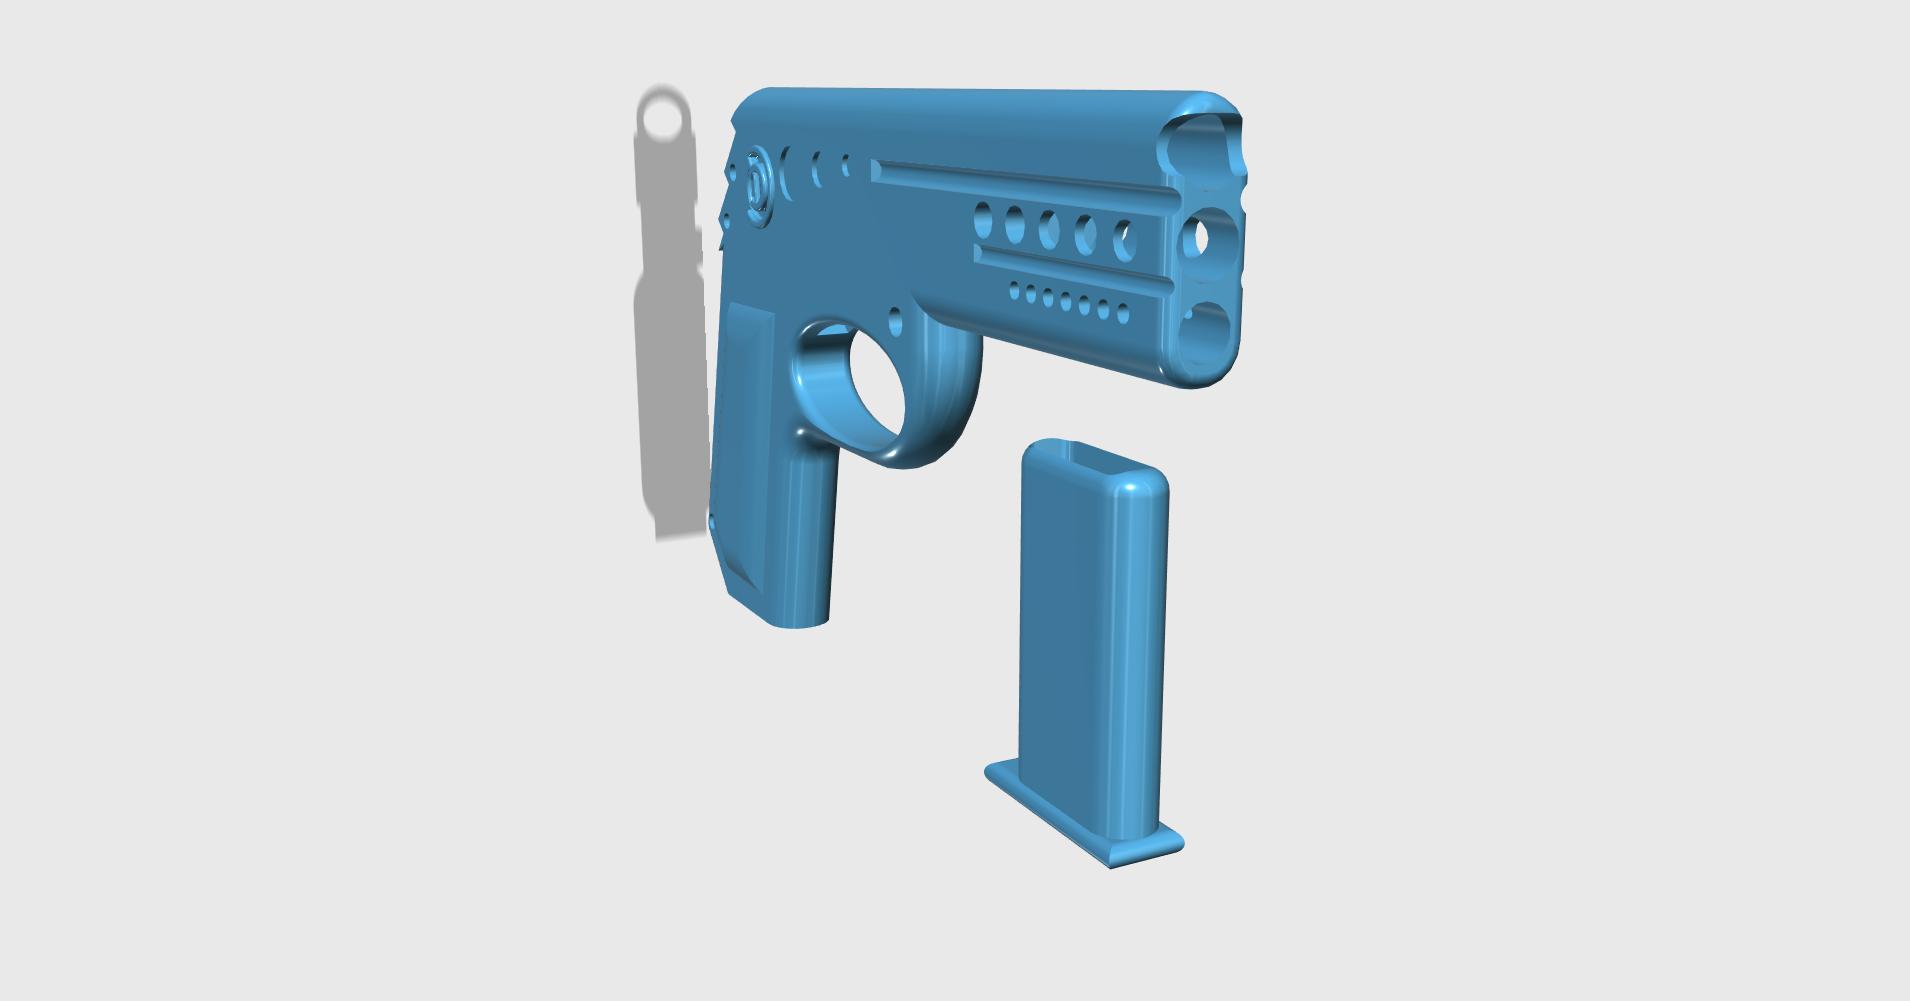 rubbergun3.png Download STL file GUN SHOOTS RUBBERBAND  • 3D printing object, JonathanOlivarDizon